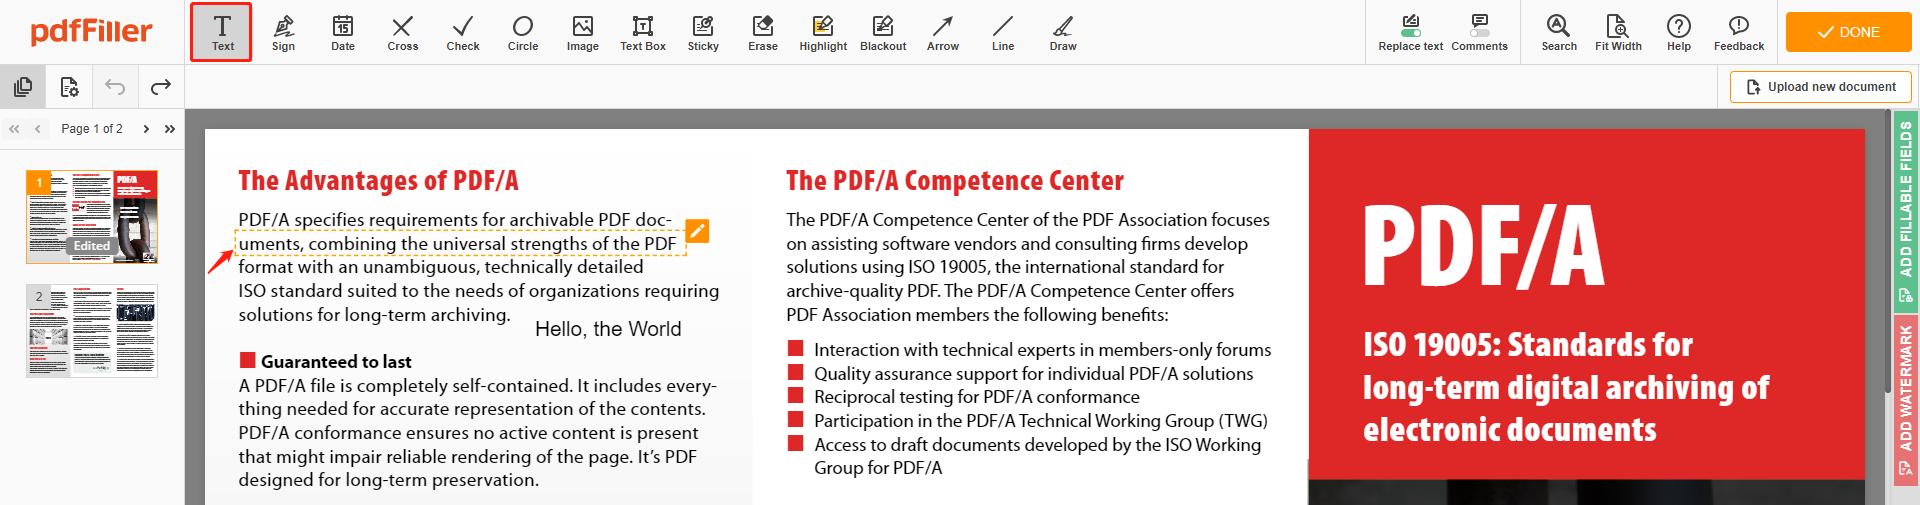 pdffiller-edit